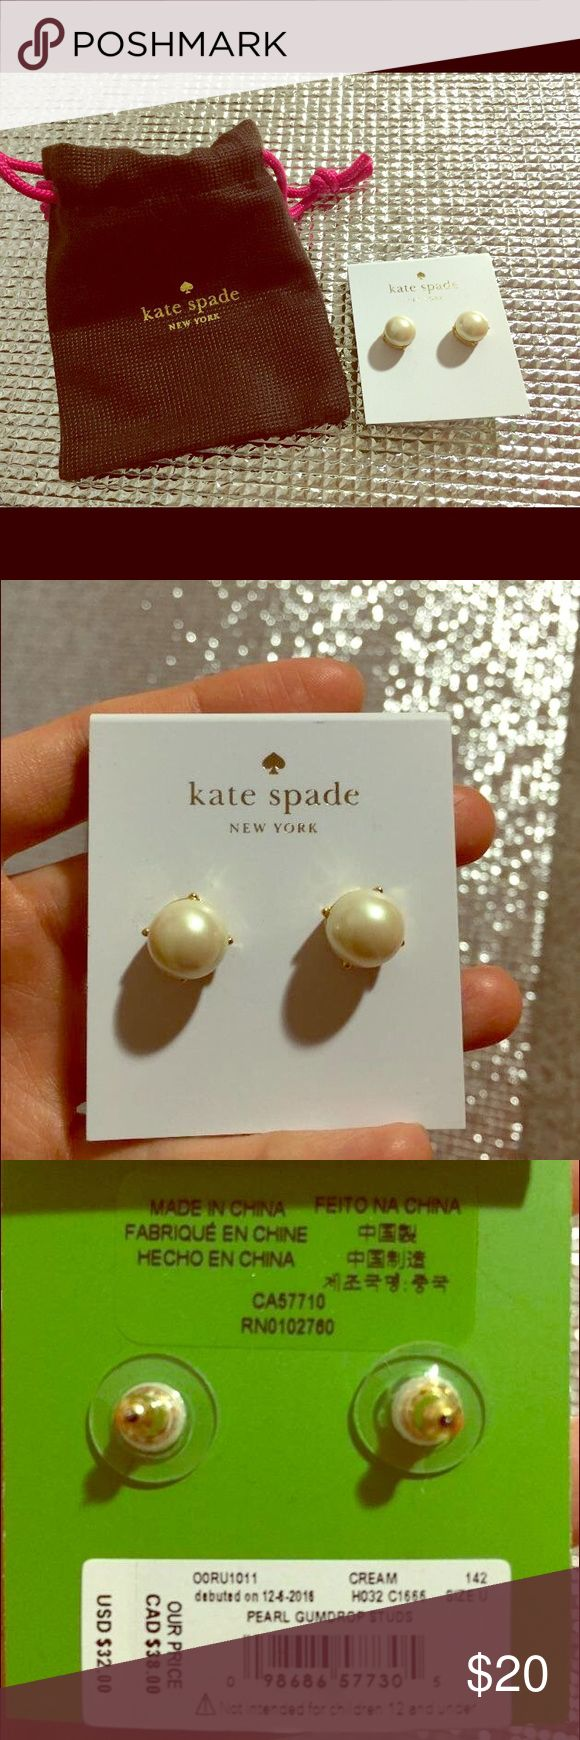 kate sapde earrings Brand new Kate spade pearl earrings. With original Kate spade little gift bag. kate spade Jewelry Earrings